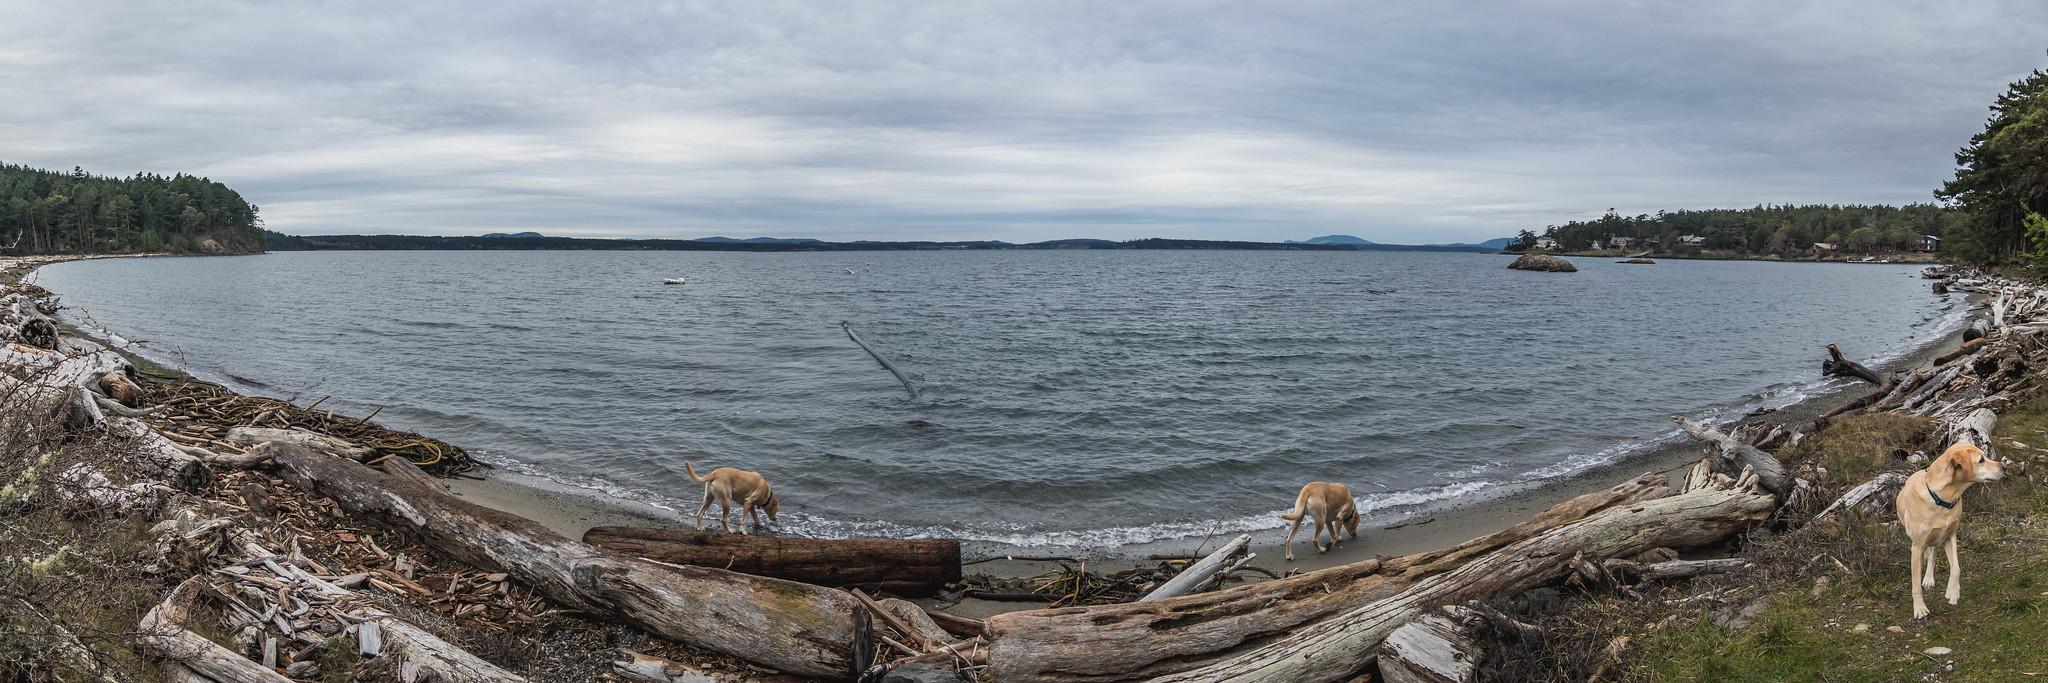 Three-dog view by Third Lagoon